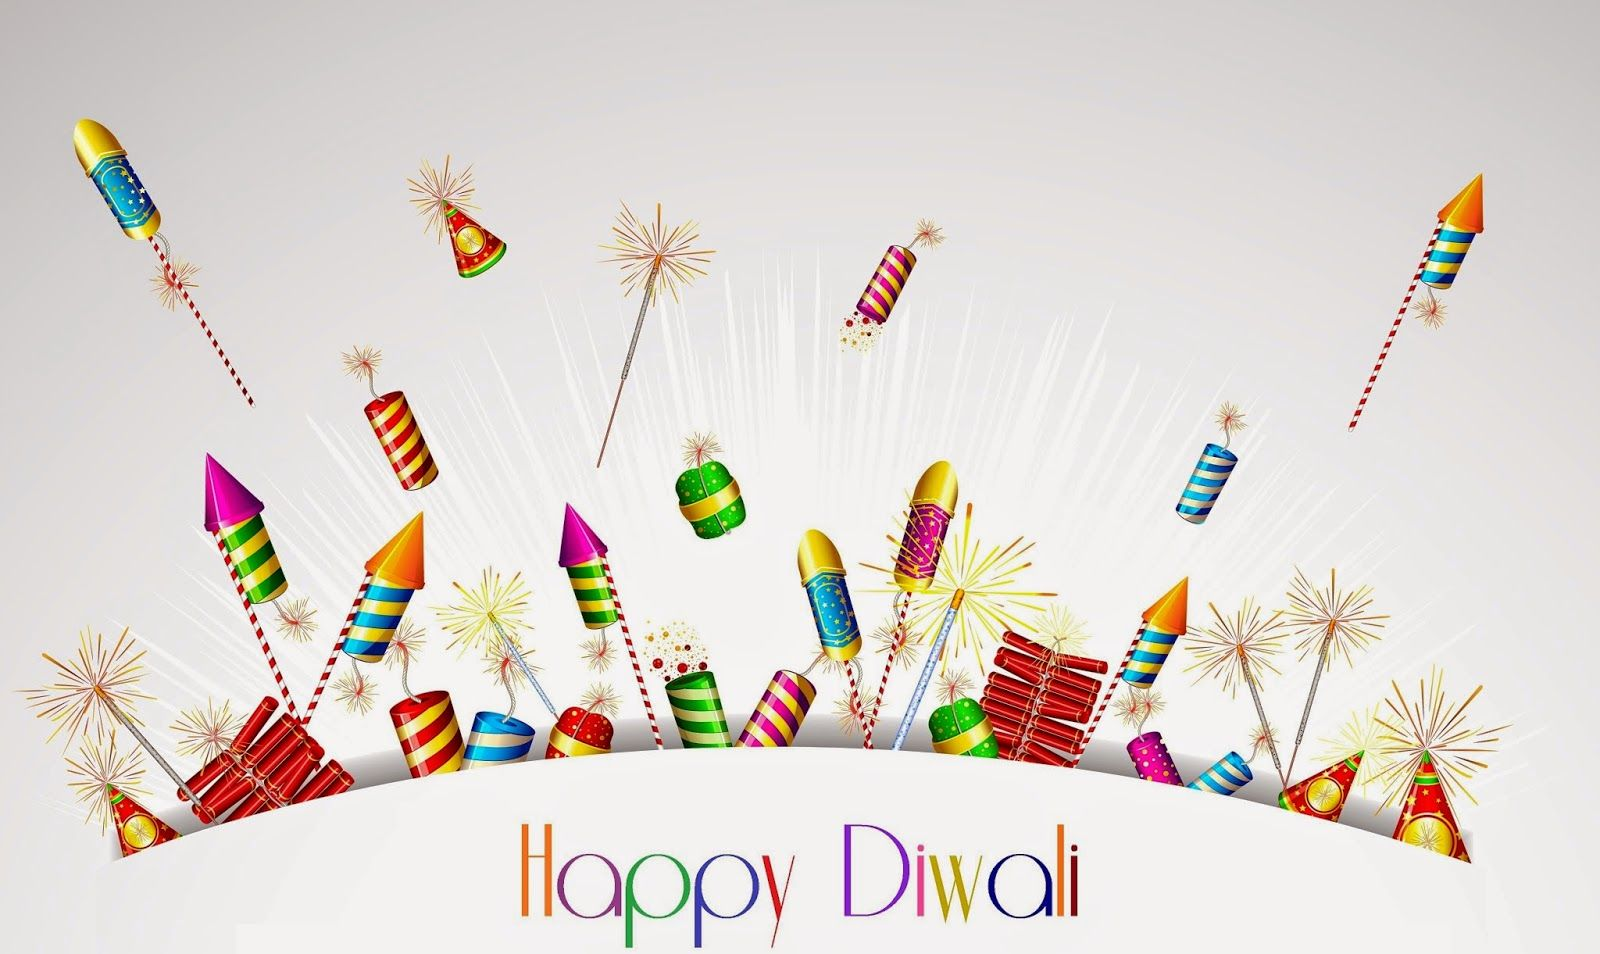 Happy diwali images wallpapers hd happy diwali images wallpapers happy diwali images wallpapers hd happy diwali images wallpapers 2015 hd happy diwali 3d m4hsunfo